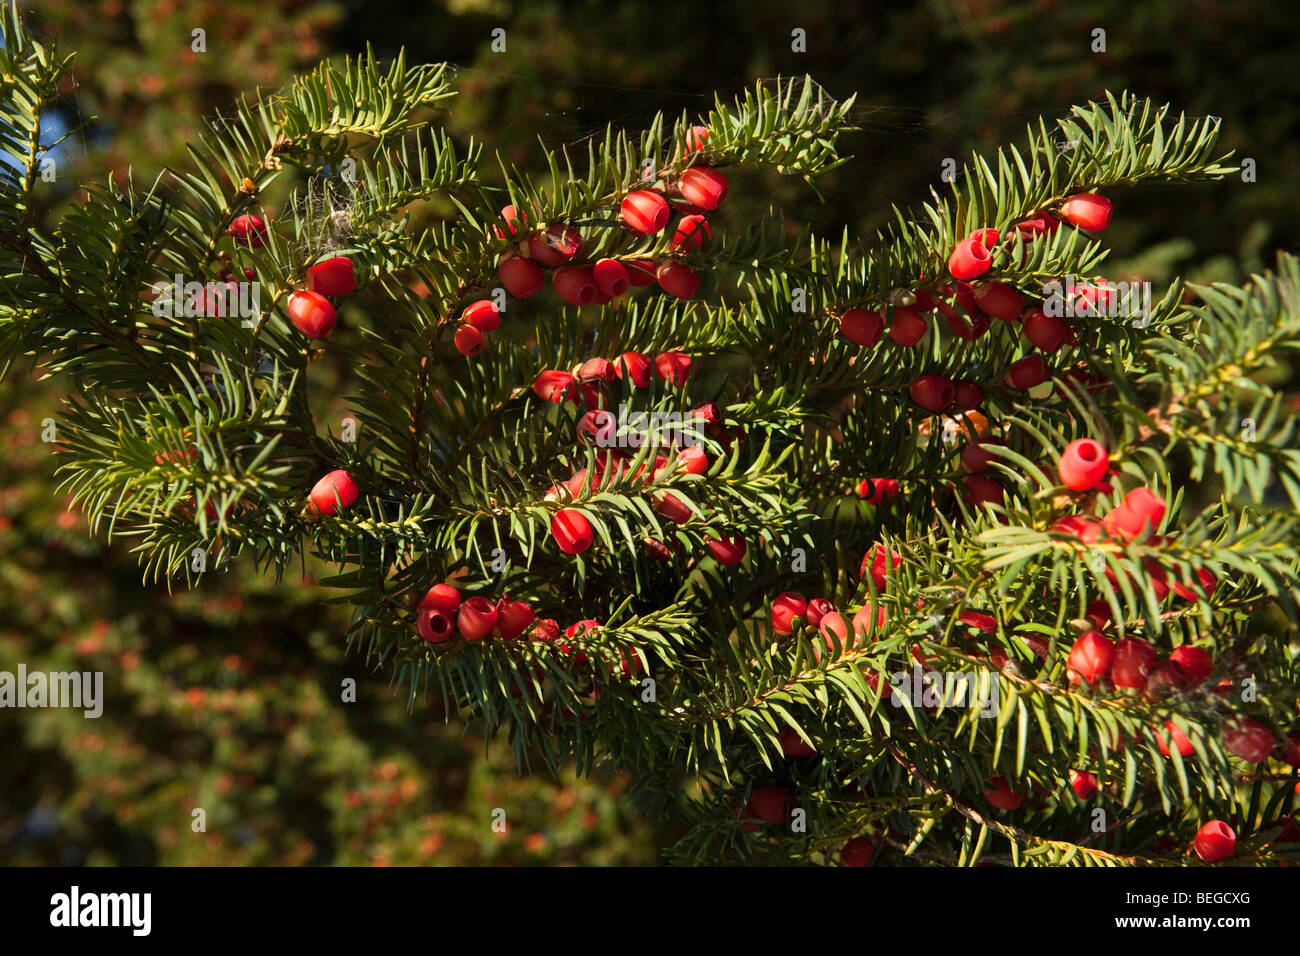 England, Cambridgeshire, Hemingford Grey, St James' Churchyard, ripe red yew tree berries - Stock Image